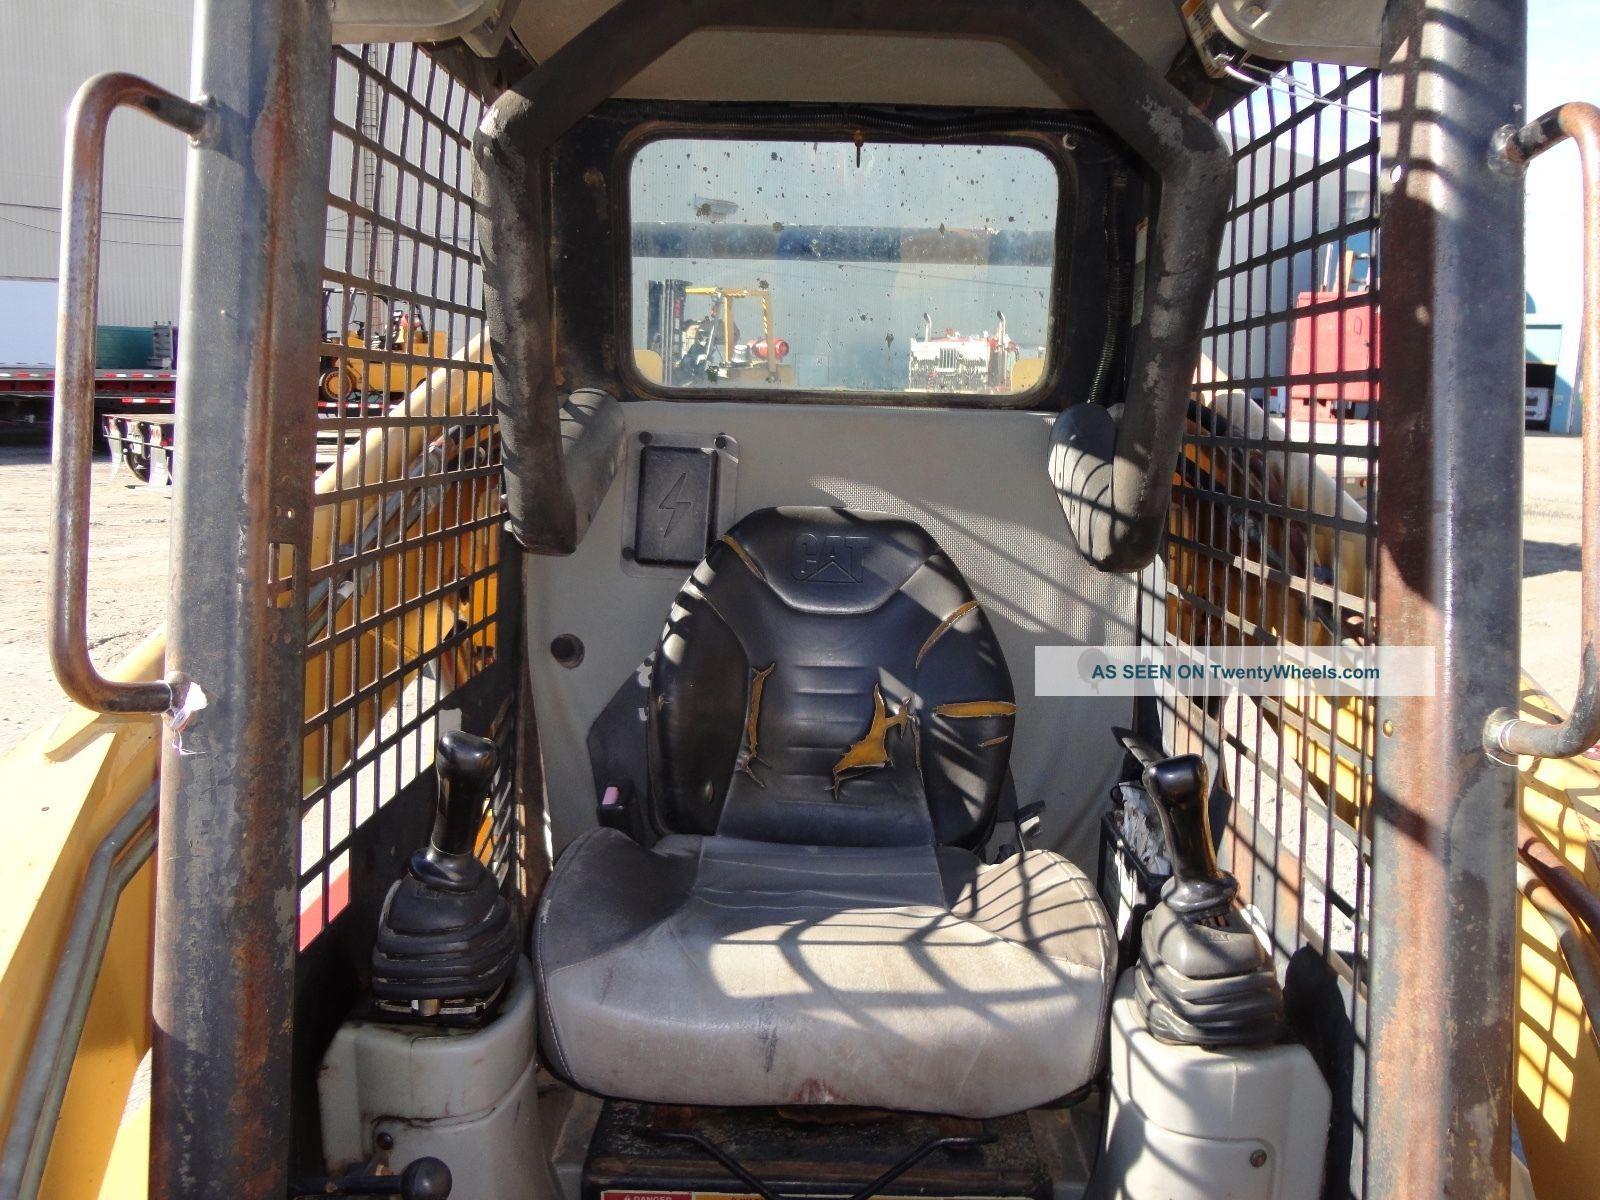 Cat 252 Wheel Skid Steer Loader - Aux Hydraulics - Joystick